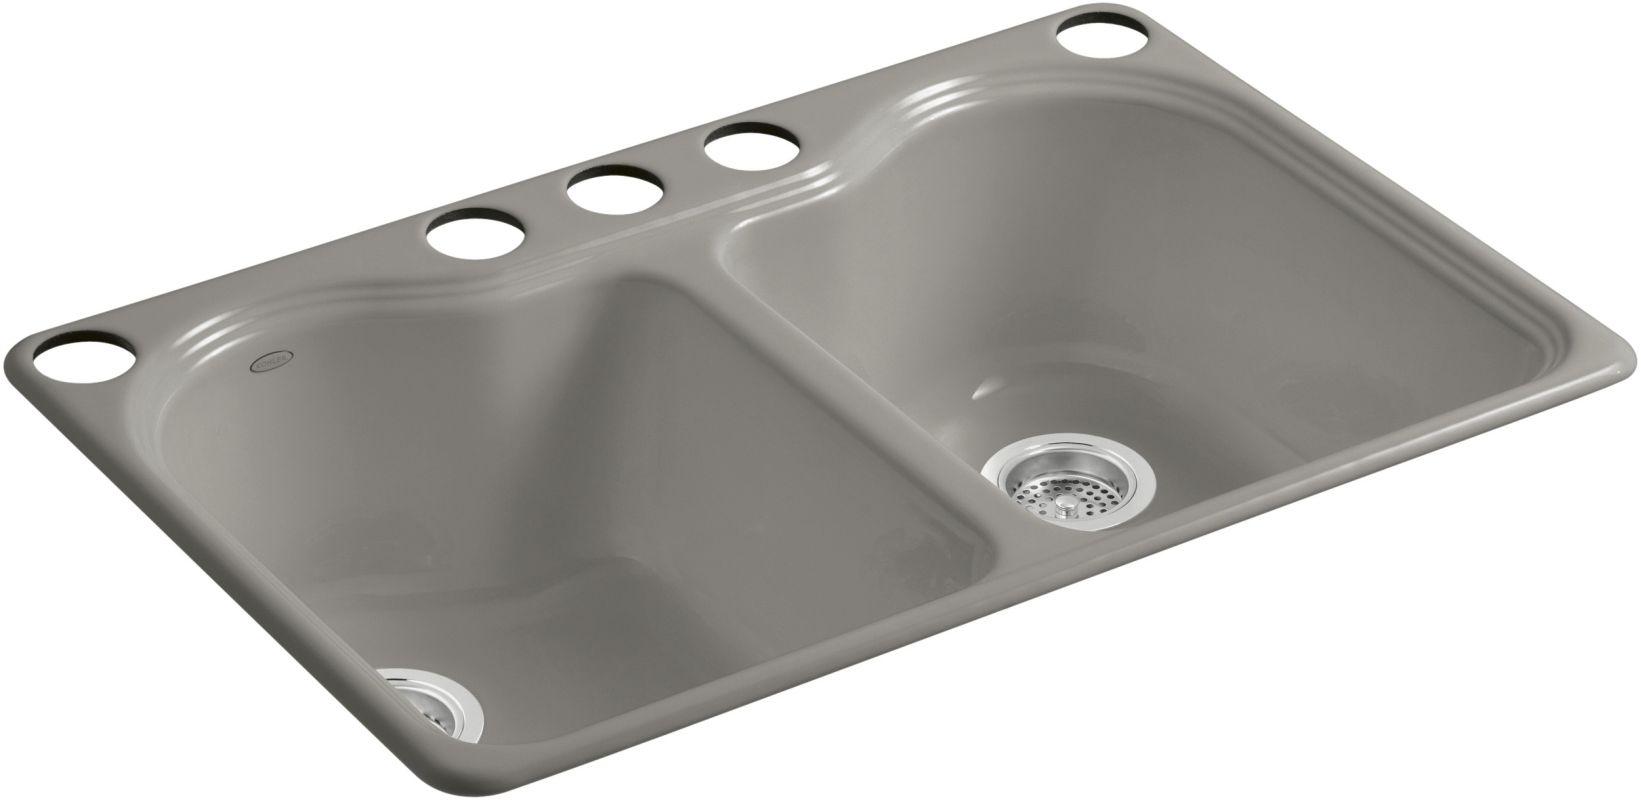 Undermount Kitchen Sink To Fit A  Inch Cabinet